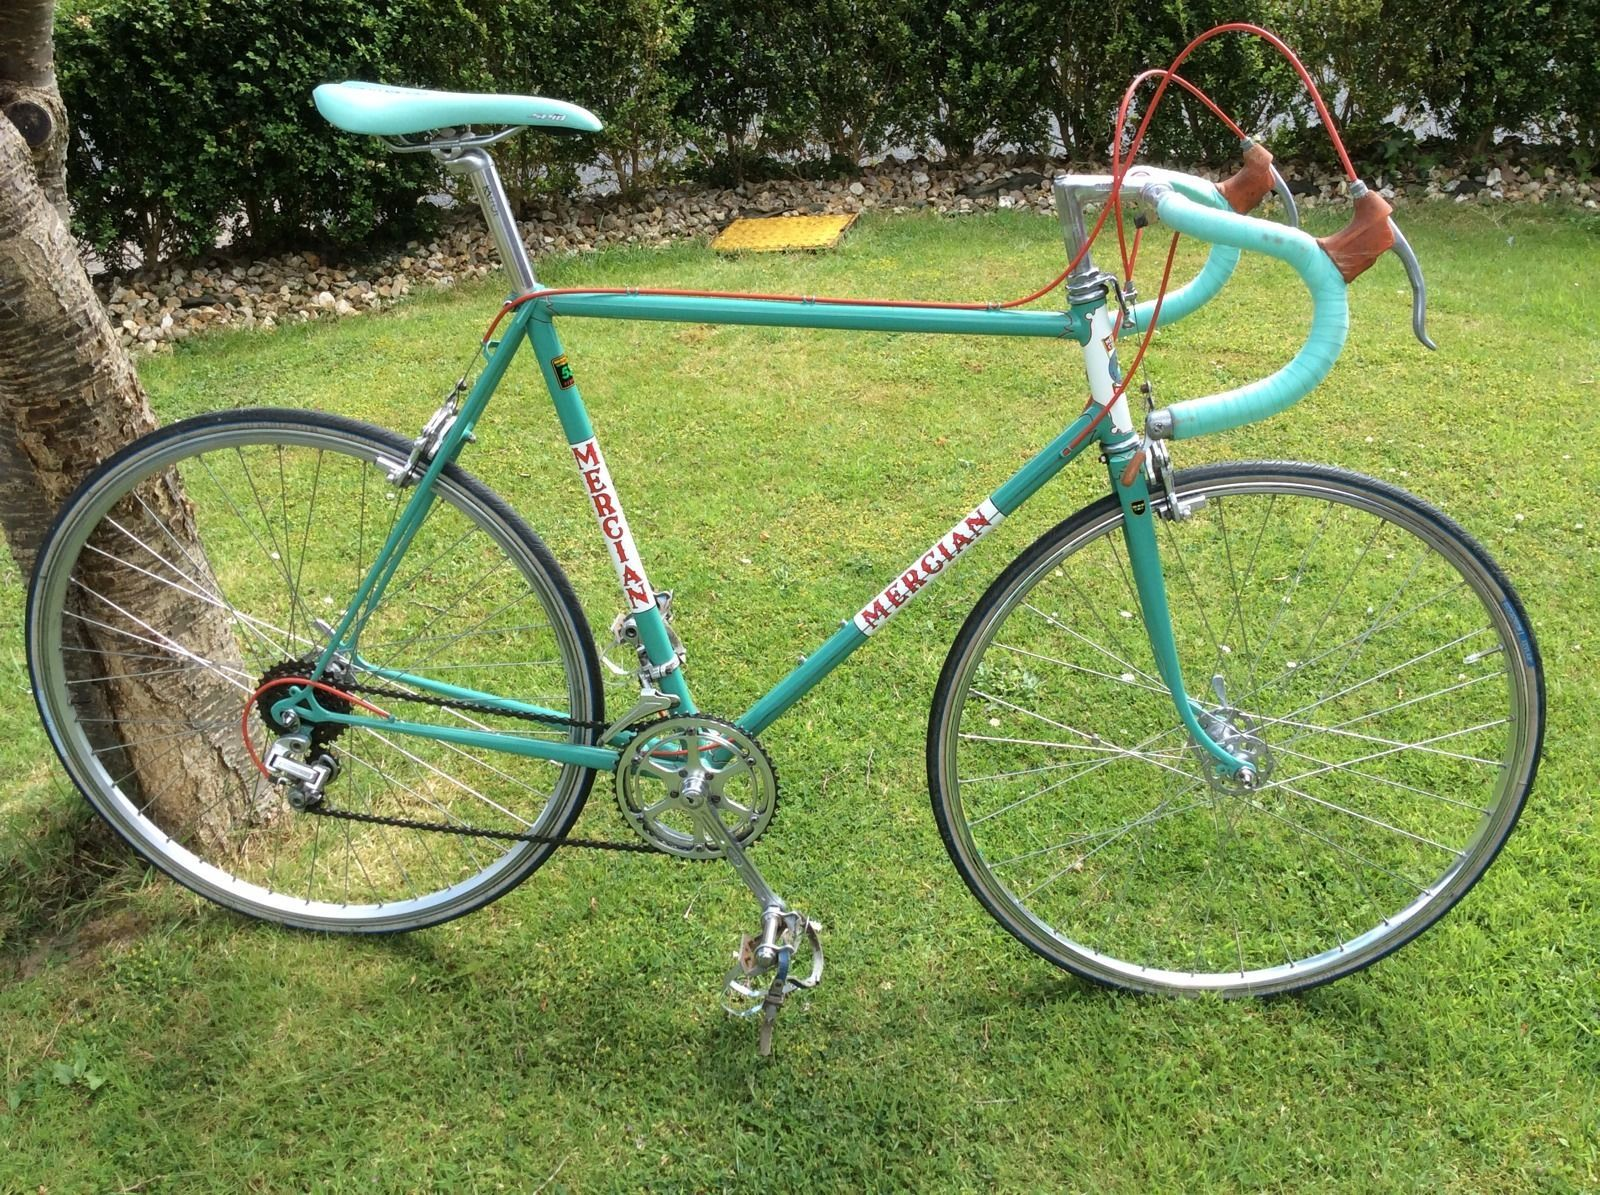 Vintage Retro Classic Mercian Road Bike Campagnolo Shifters Record Hubs Ebay Road Bike Vintage Classic Road Bike Vintage Bike Parts